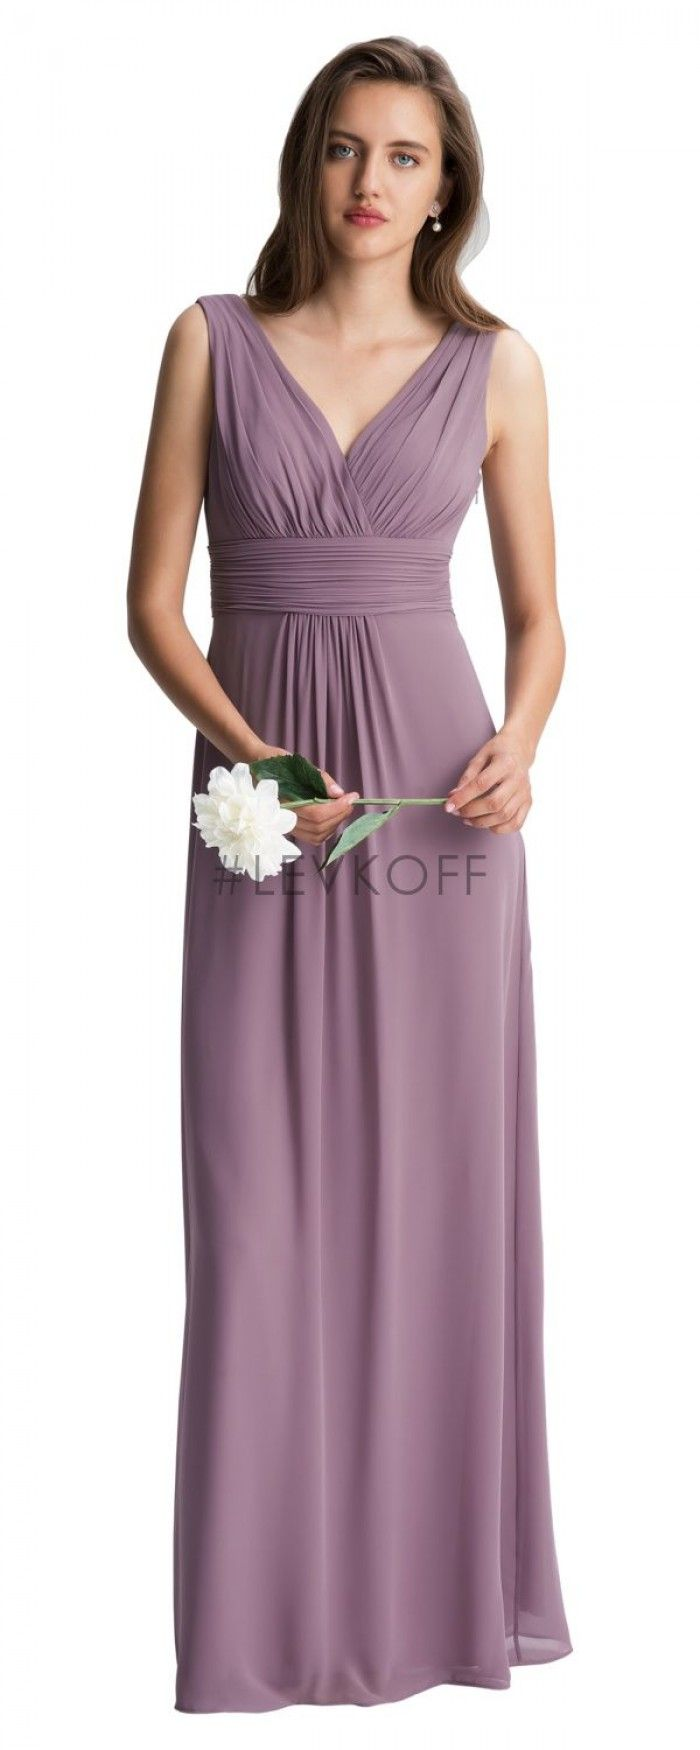 195 mejores imágenes de Bridesmaid Dresses en Pinterest   Taller ...